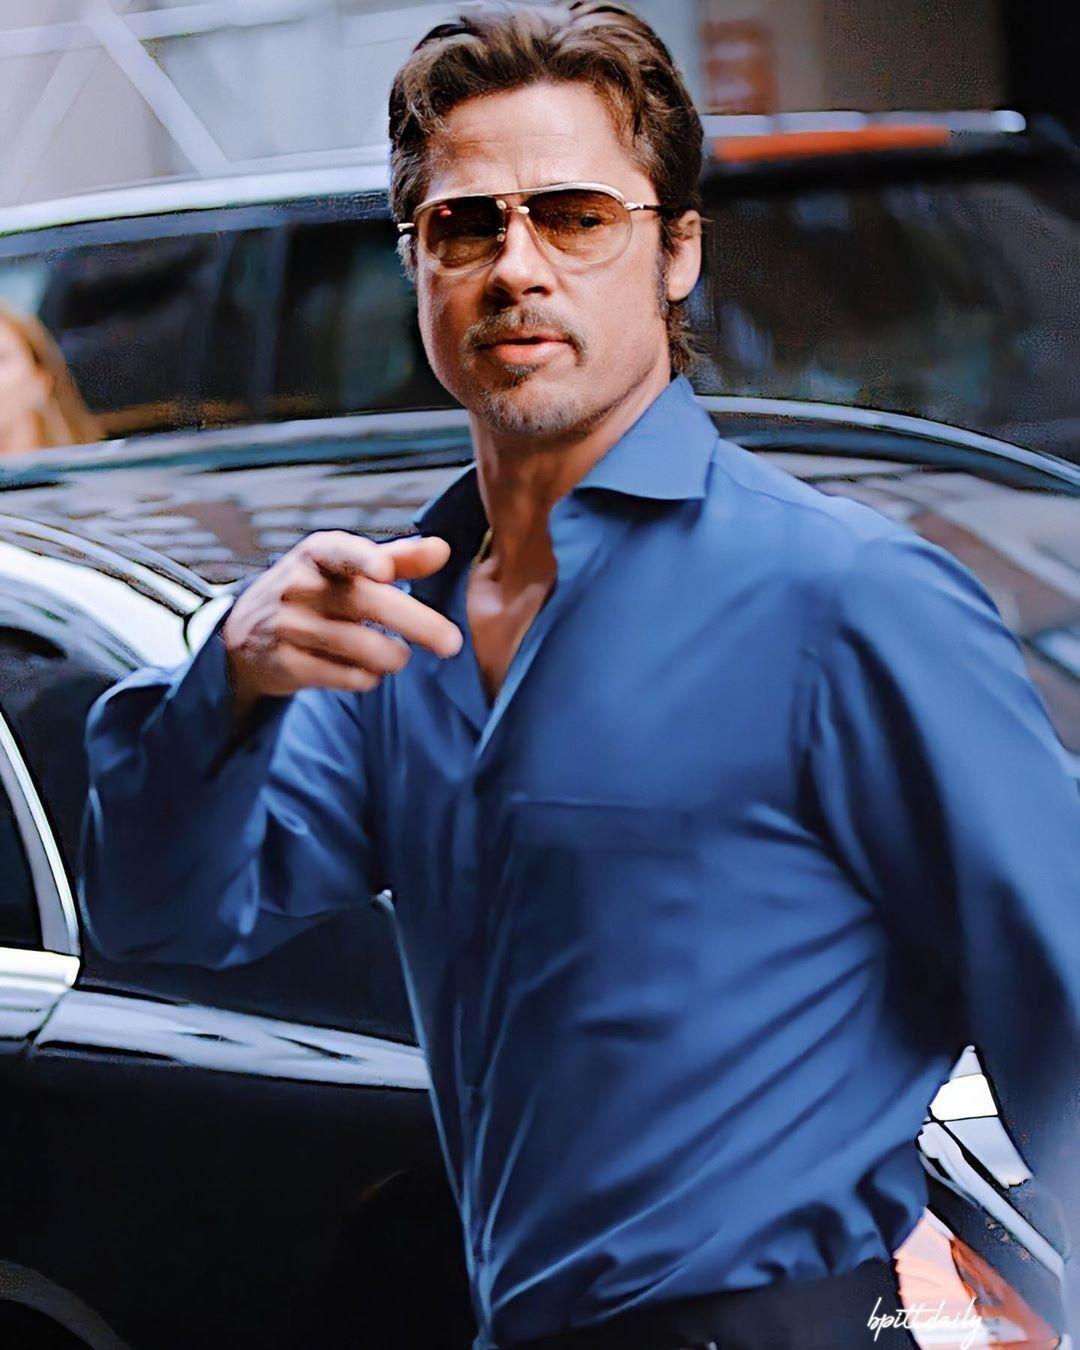 Brad Pitt Wallpaper 3 Dorawang Blog In 2020 Brad Pitt Brad Pitt Shirtless Brad Pitt Young